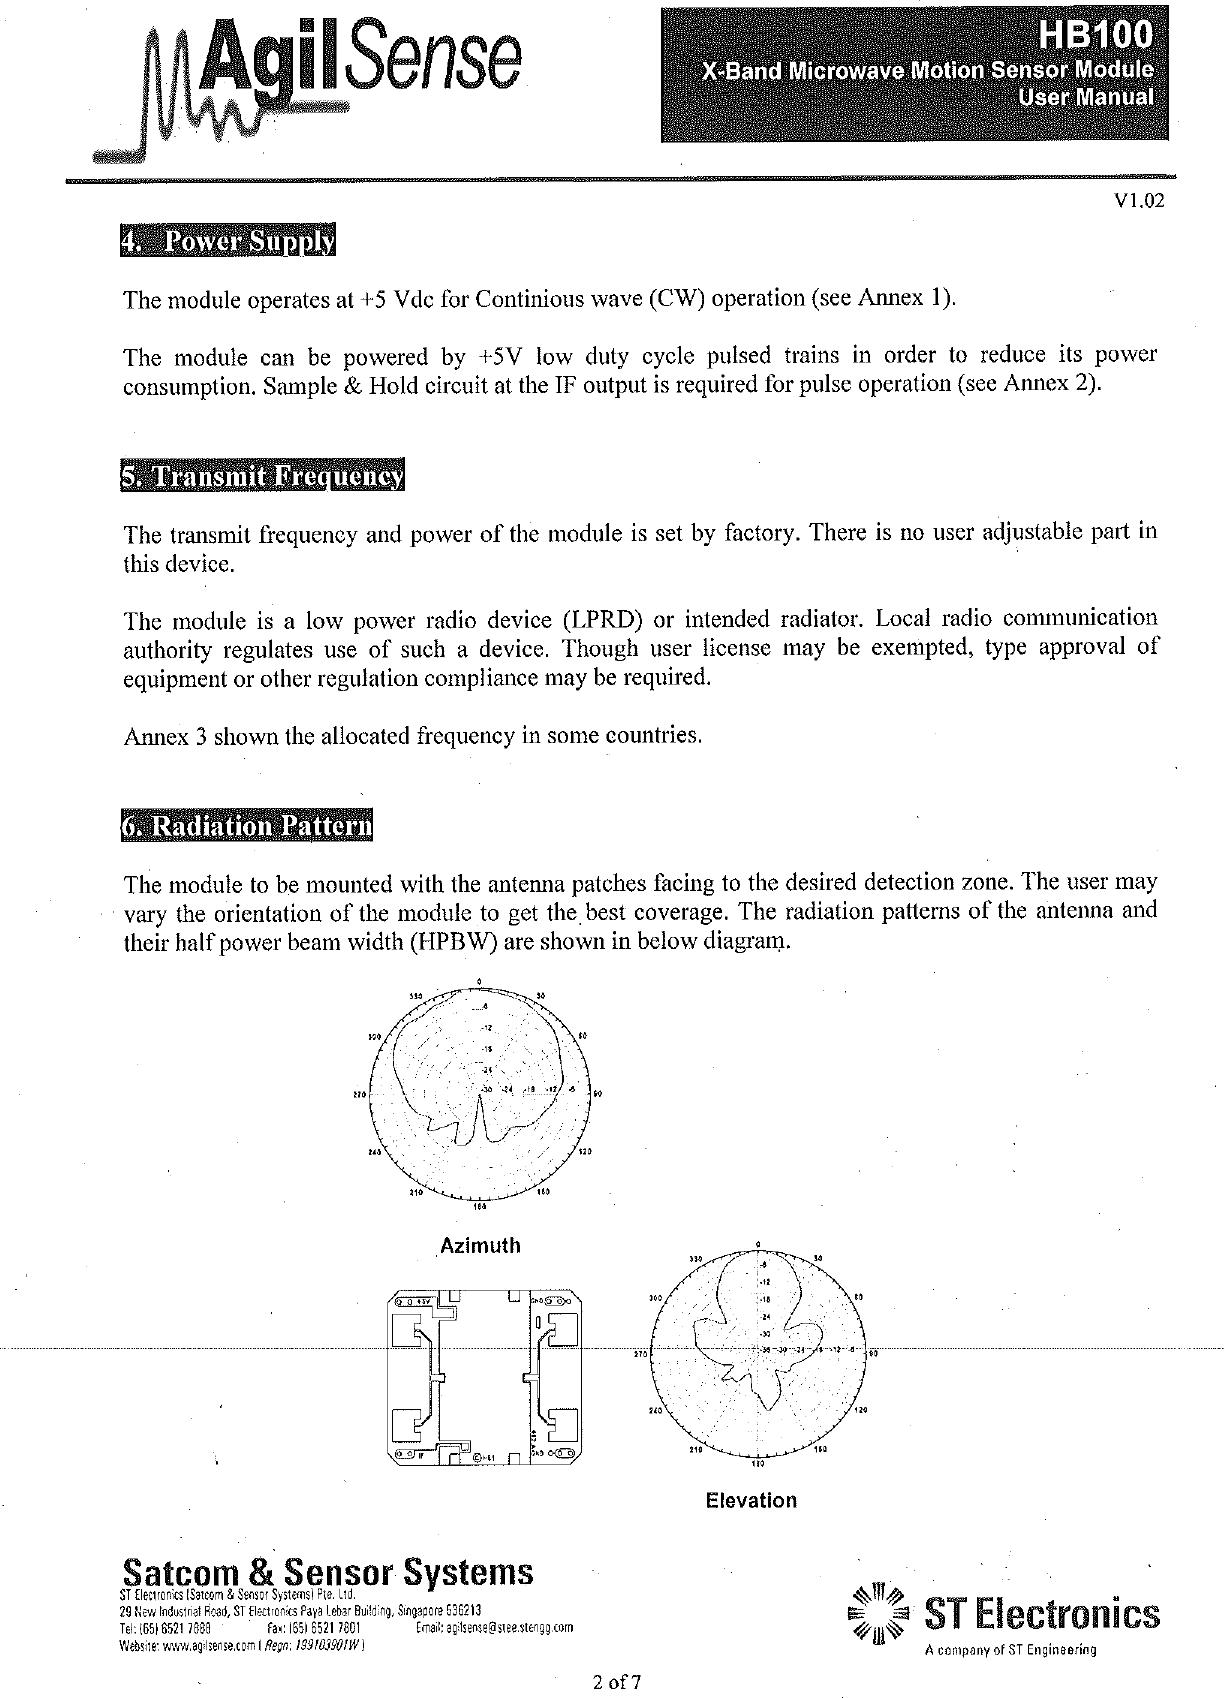 Lutron Motion Sensor Amazon Com Manual Guide